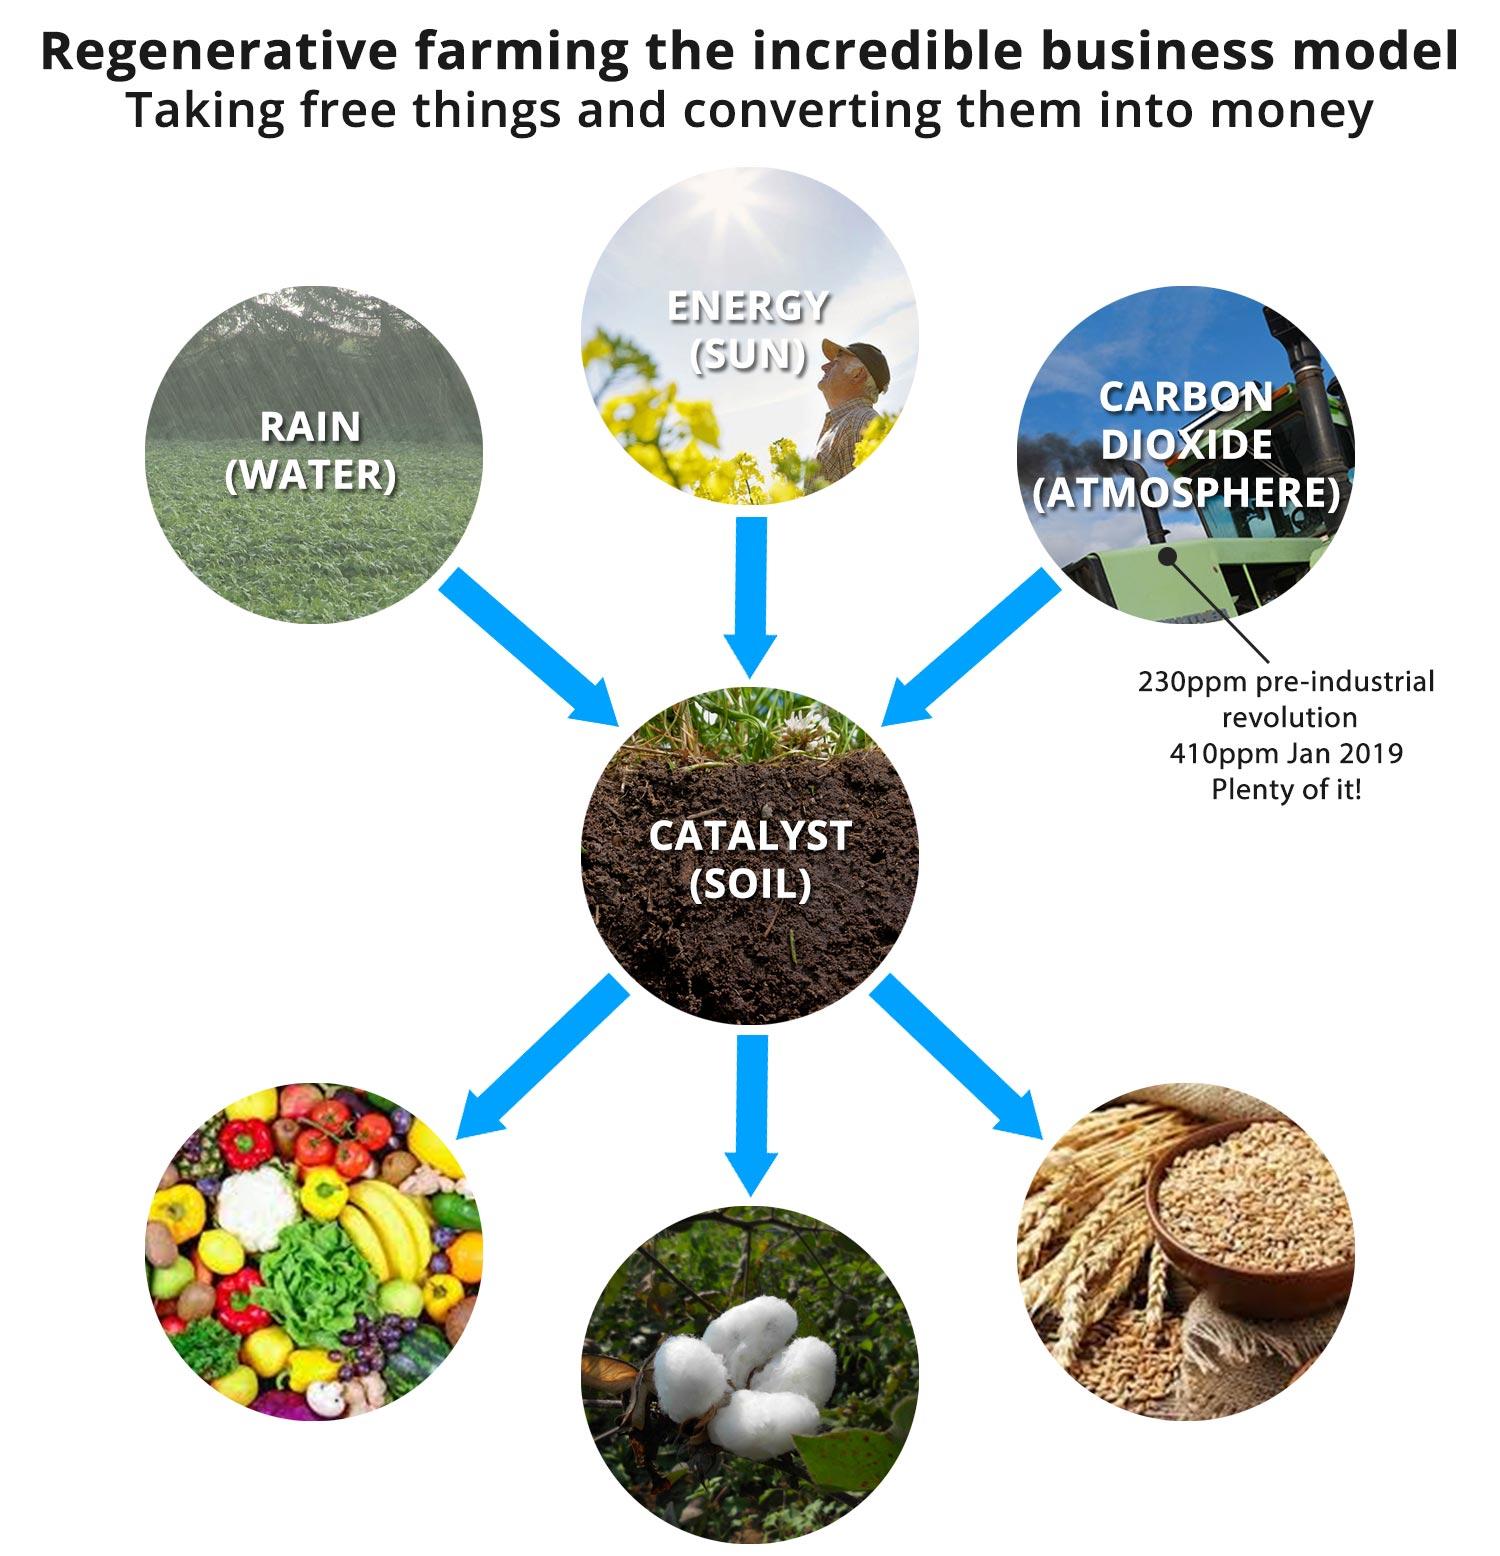 Regenerative Farming the incredible business model